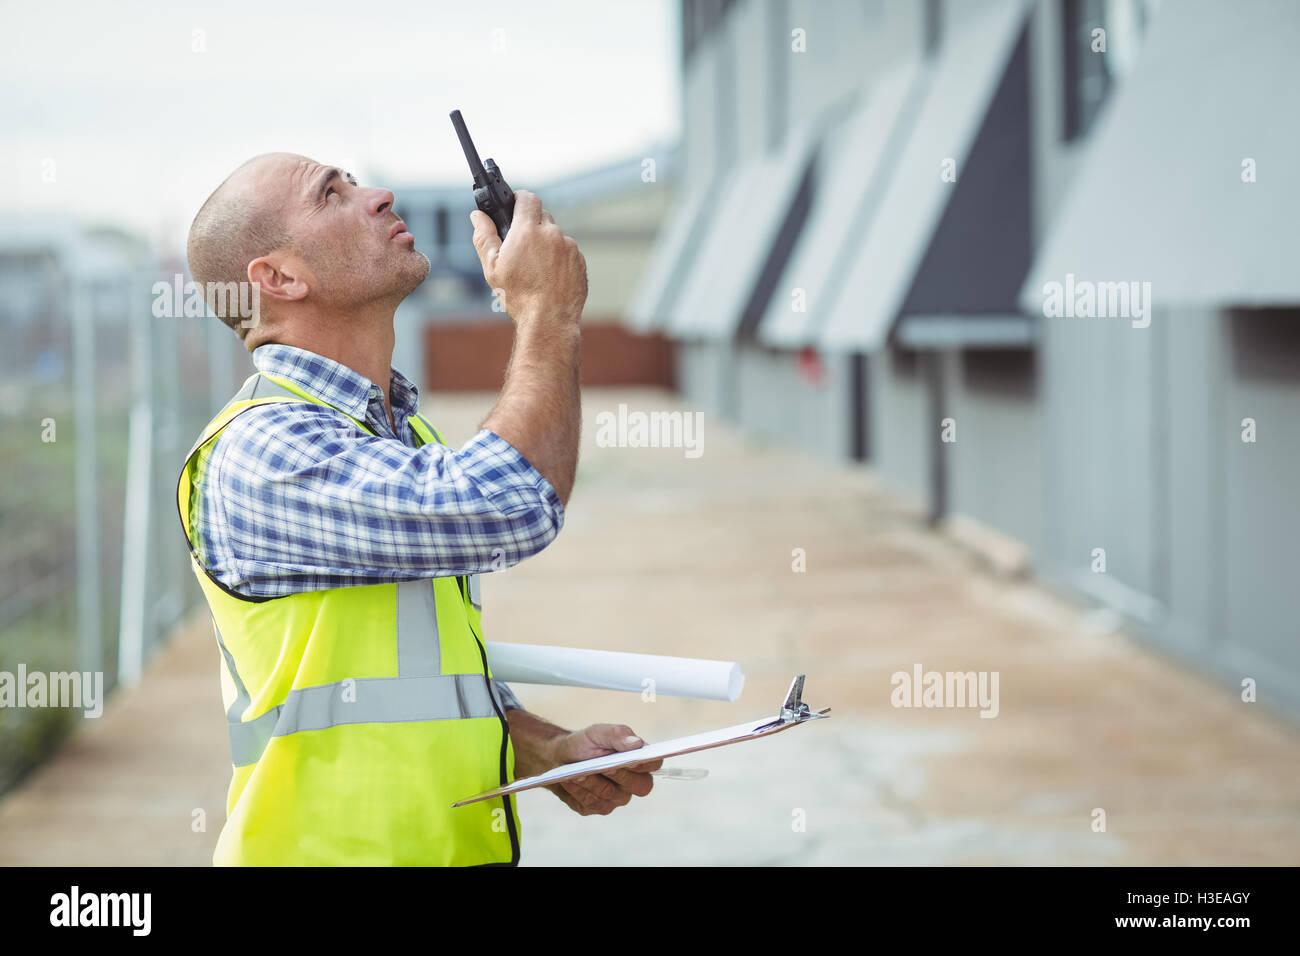 Construction worker talking on walkie-talkie - Stock Image